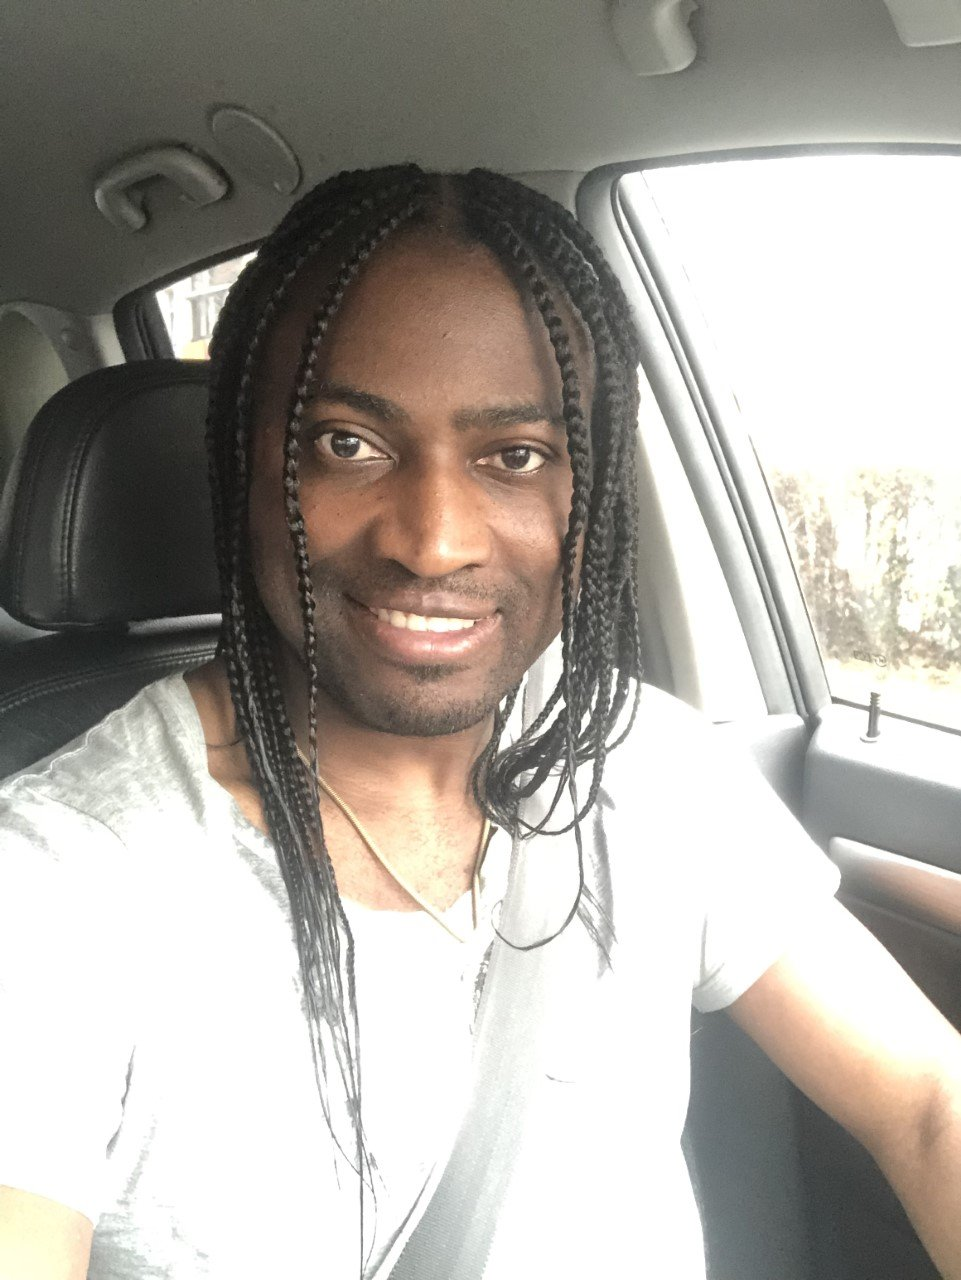 blackdoktor uit West-Vlaanderen,Belgie